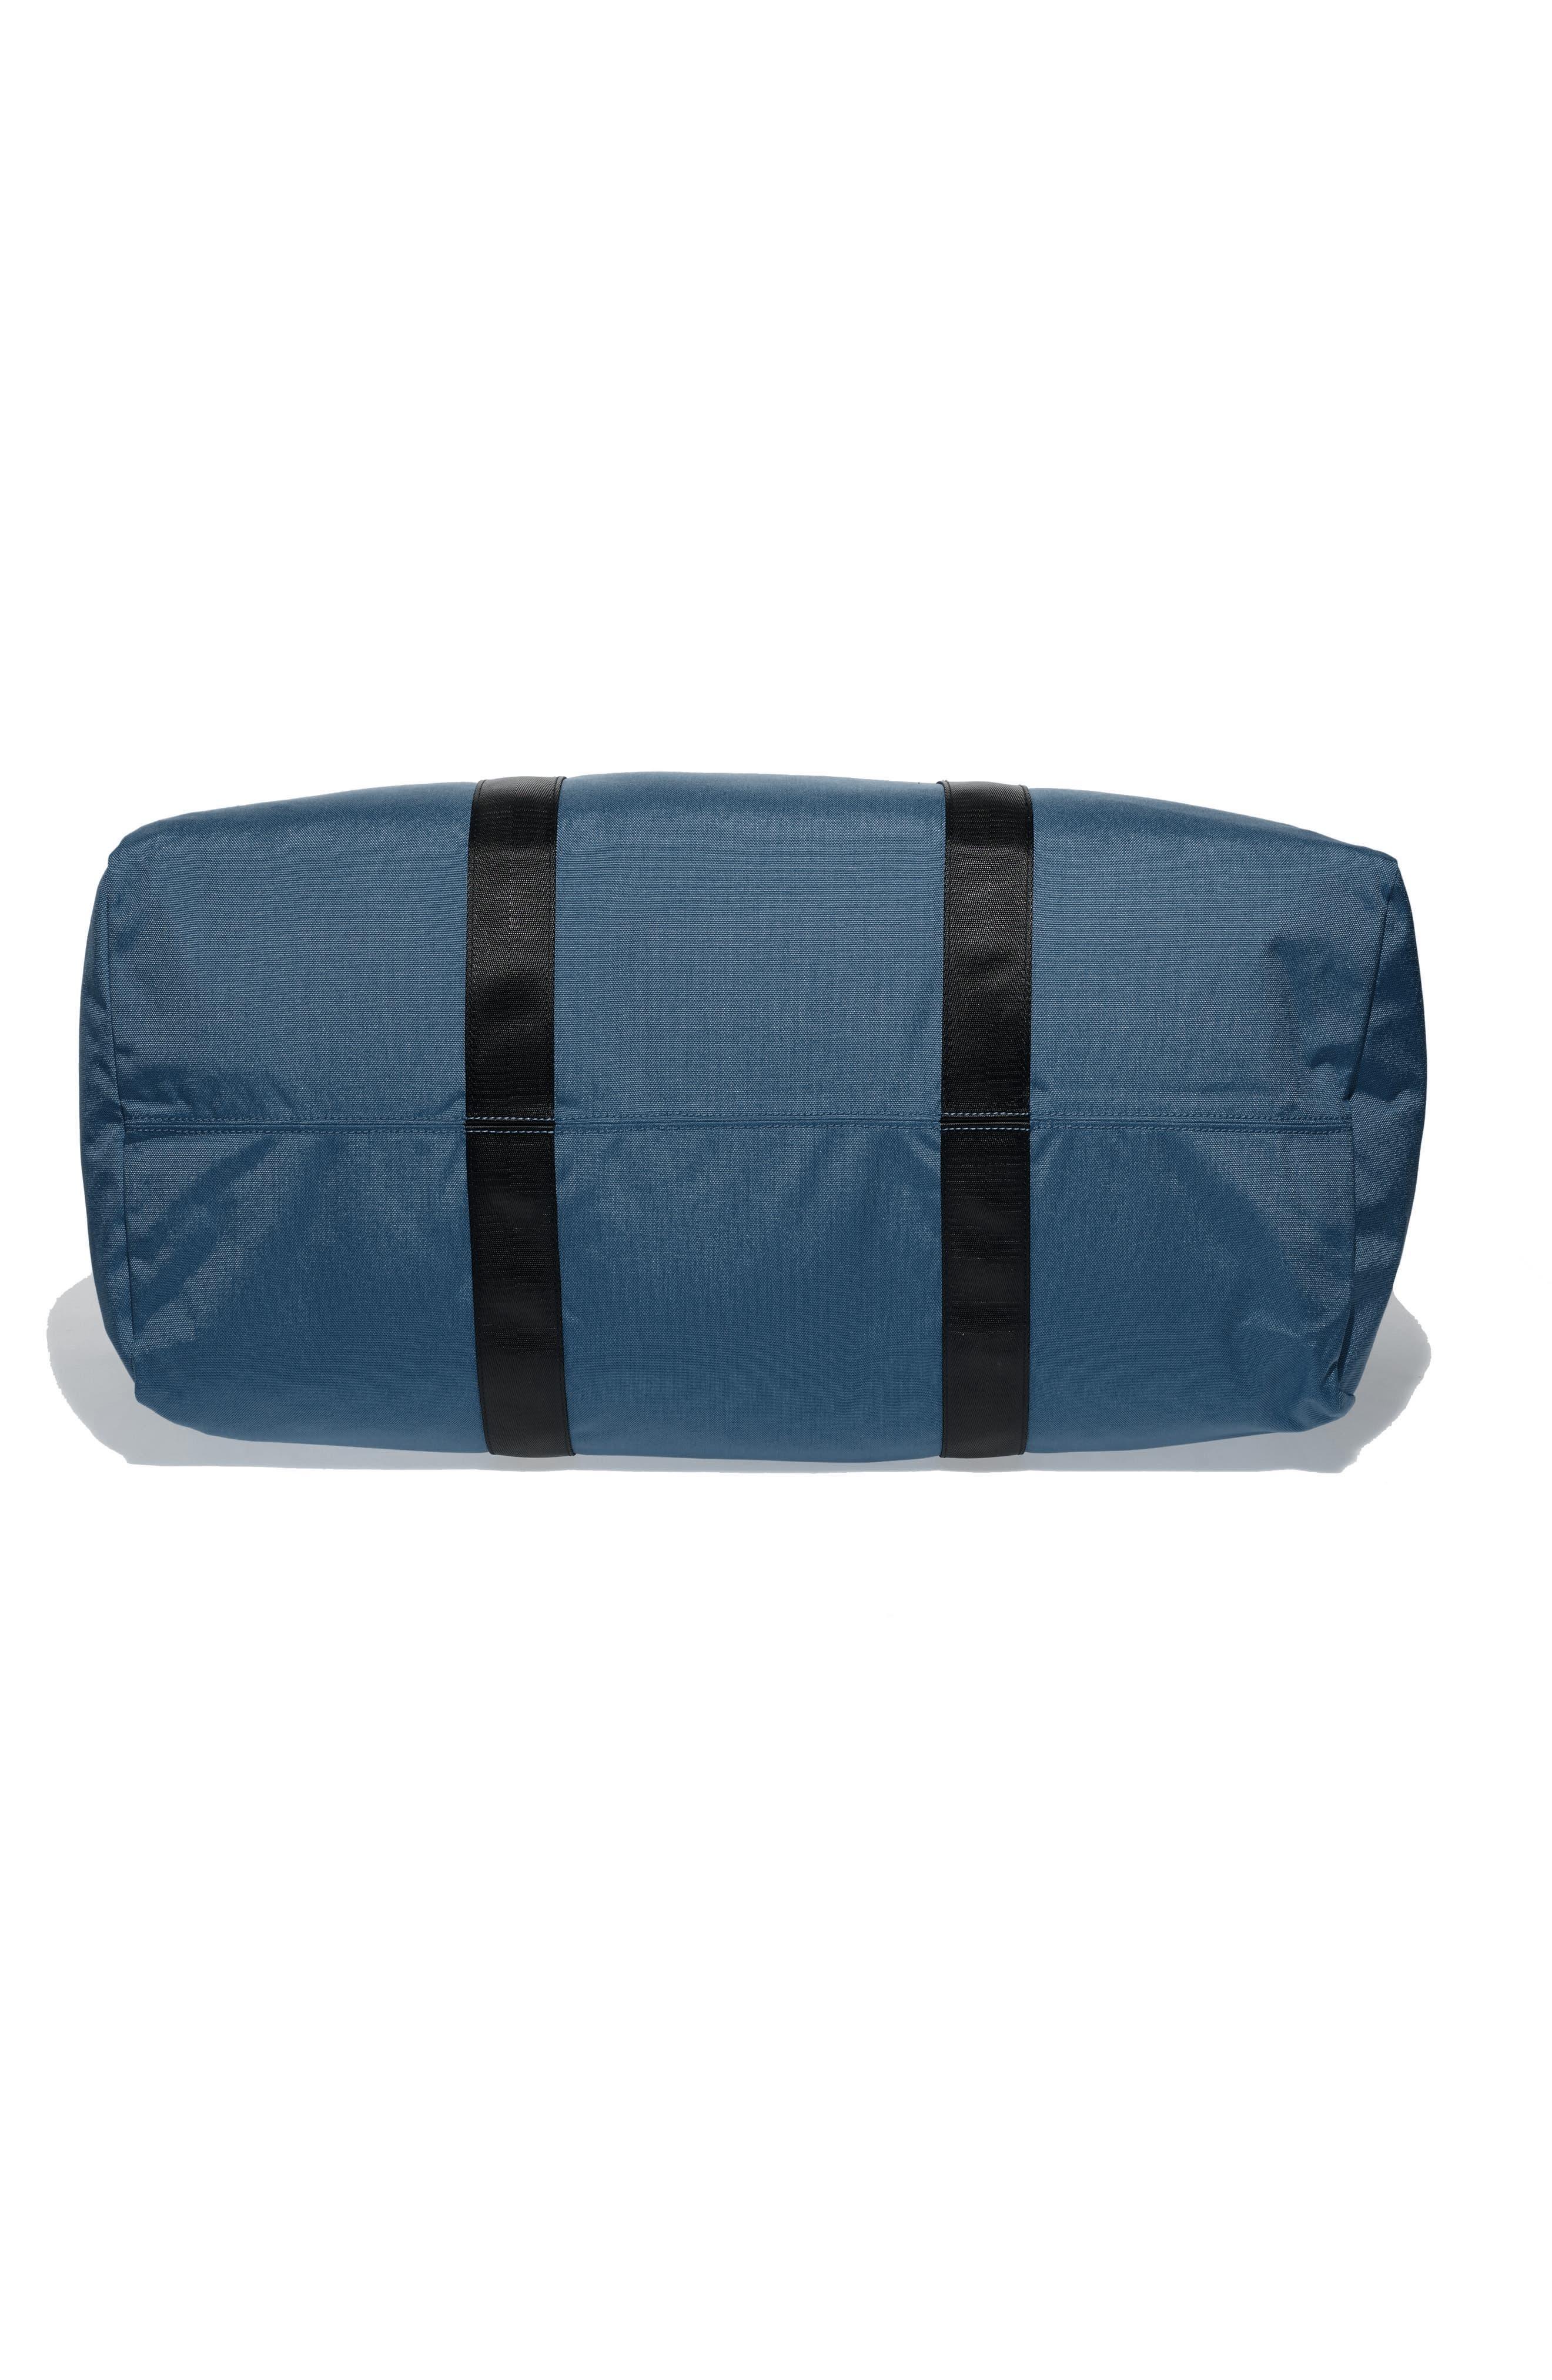 SWS 100L Roll Top Duffel Bag,                             Alternate thumbnail 5, color,                             NAVY